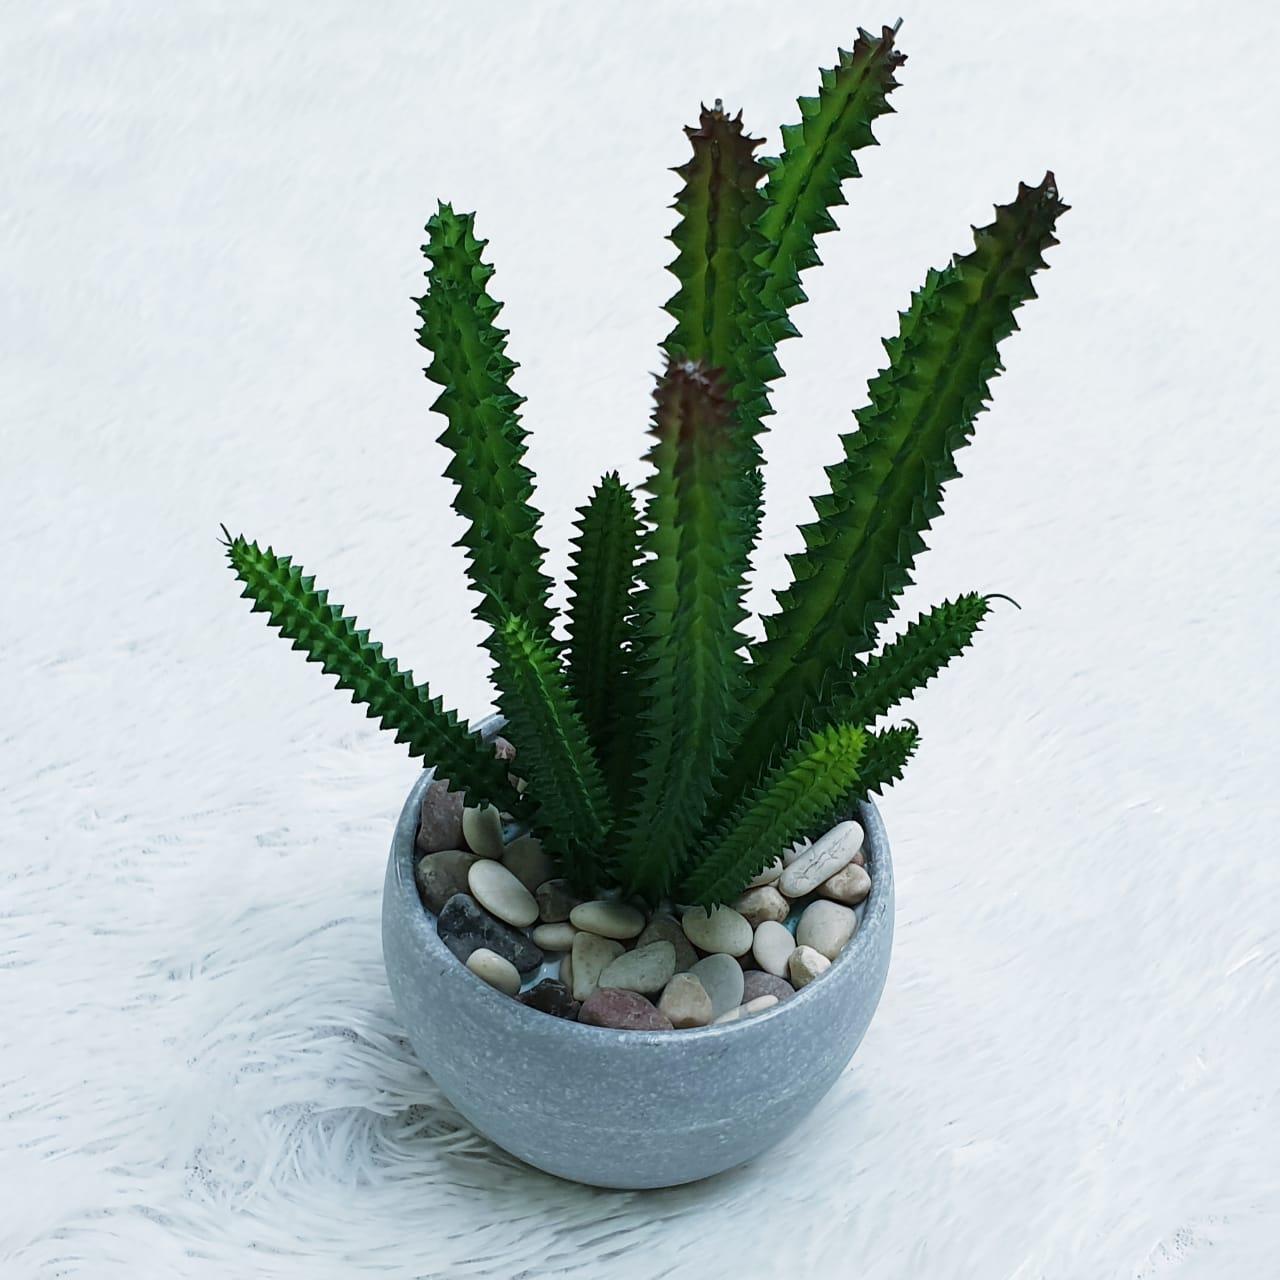 ... Hiasan Meja - Tanaman Hias - Bunga Pajangan - Bunga Artificial - Mini  Kaktus Pot Kecil 908d007201